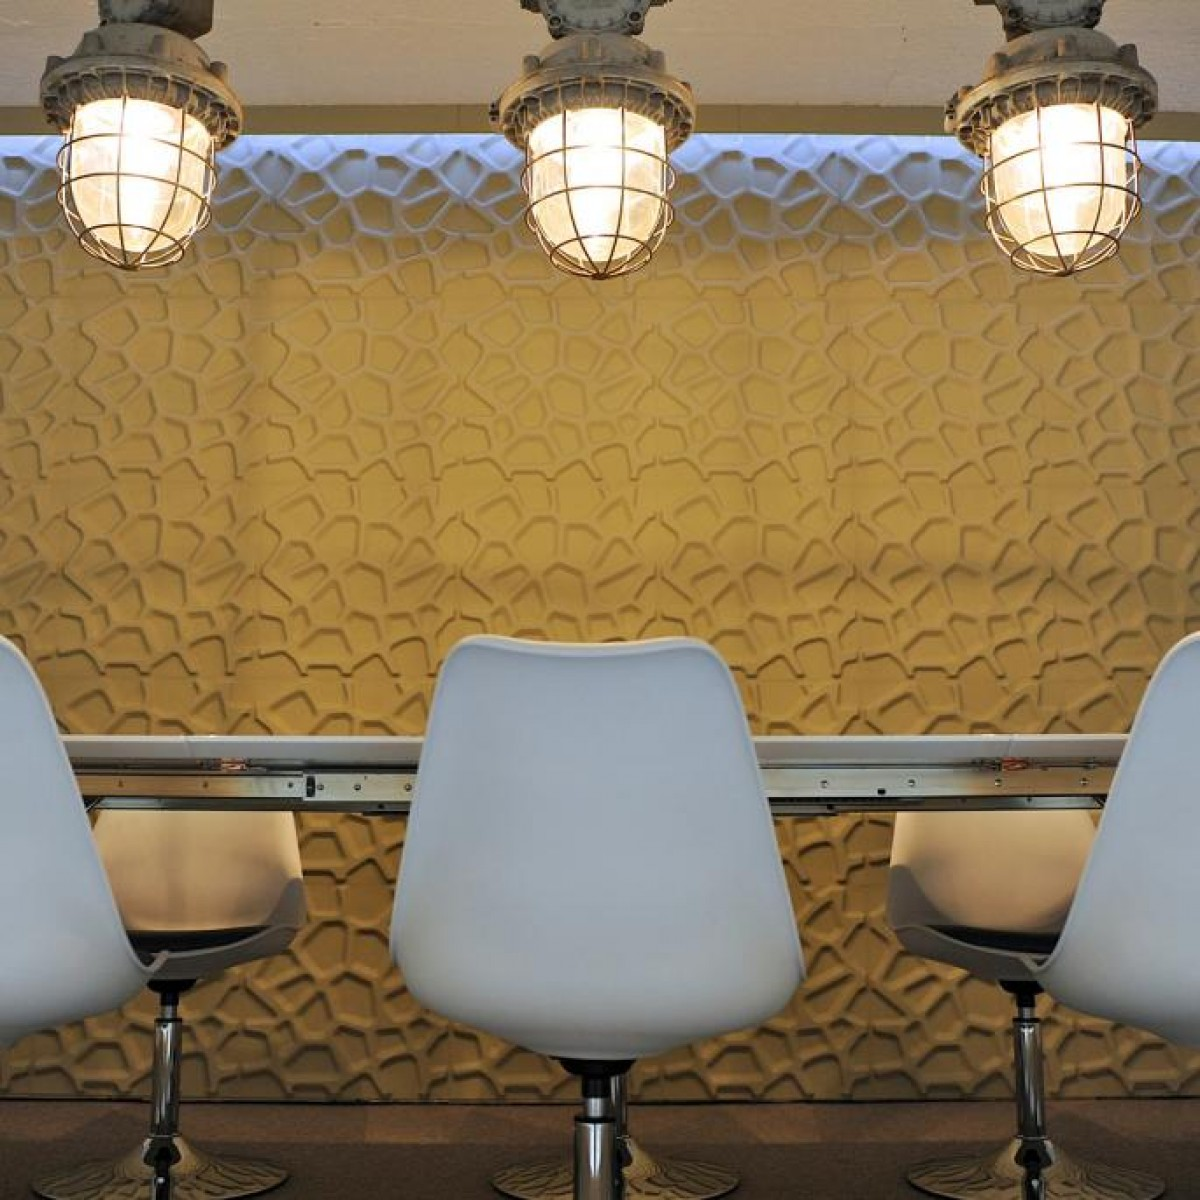 Hive Pattern Design 3D Glue On Wall Panel / Wall Flats - Box of 10 ...